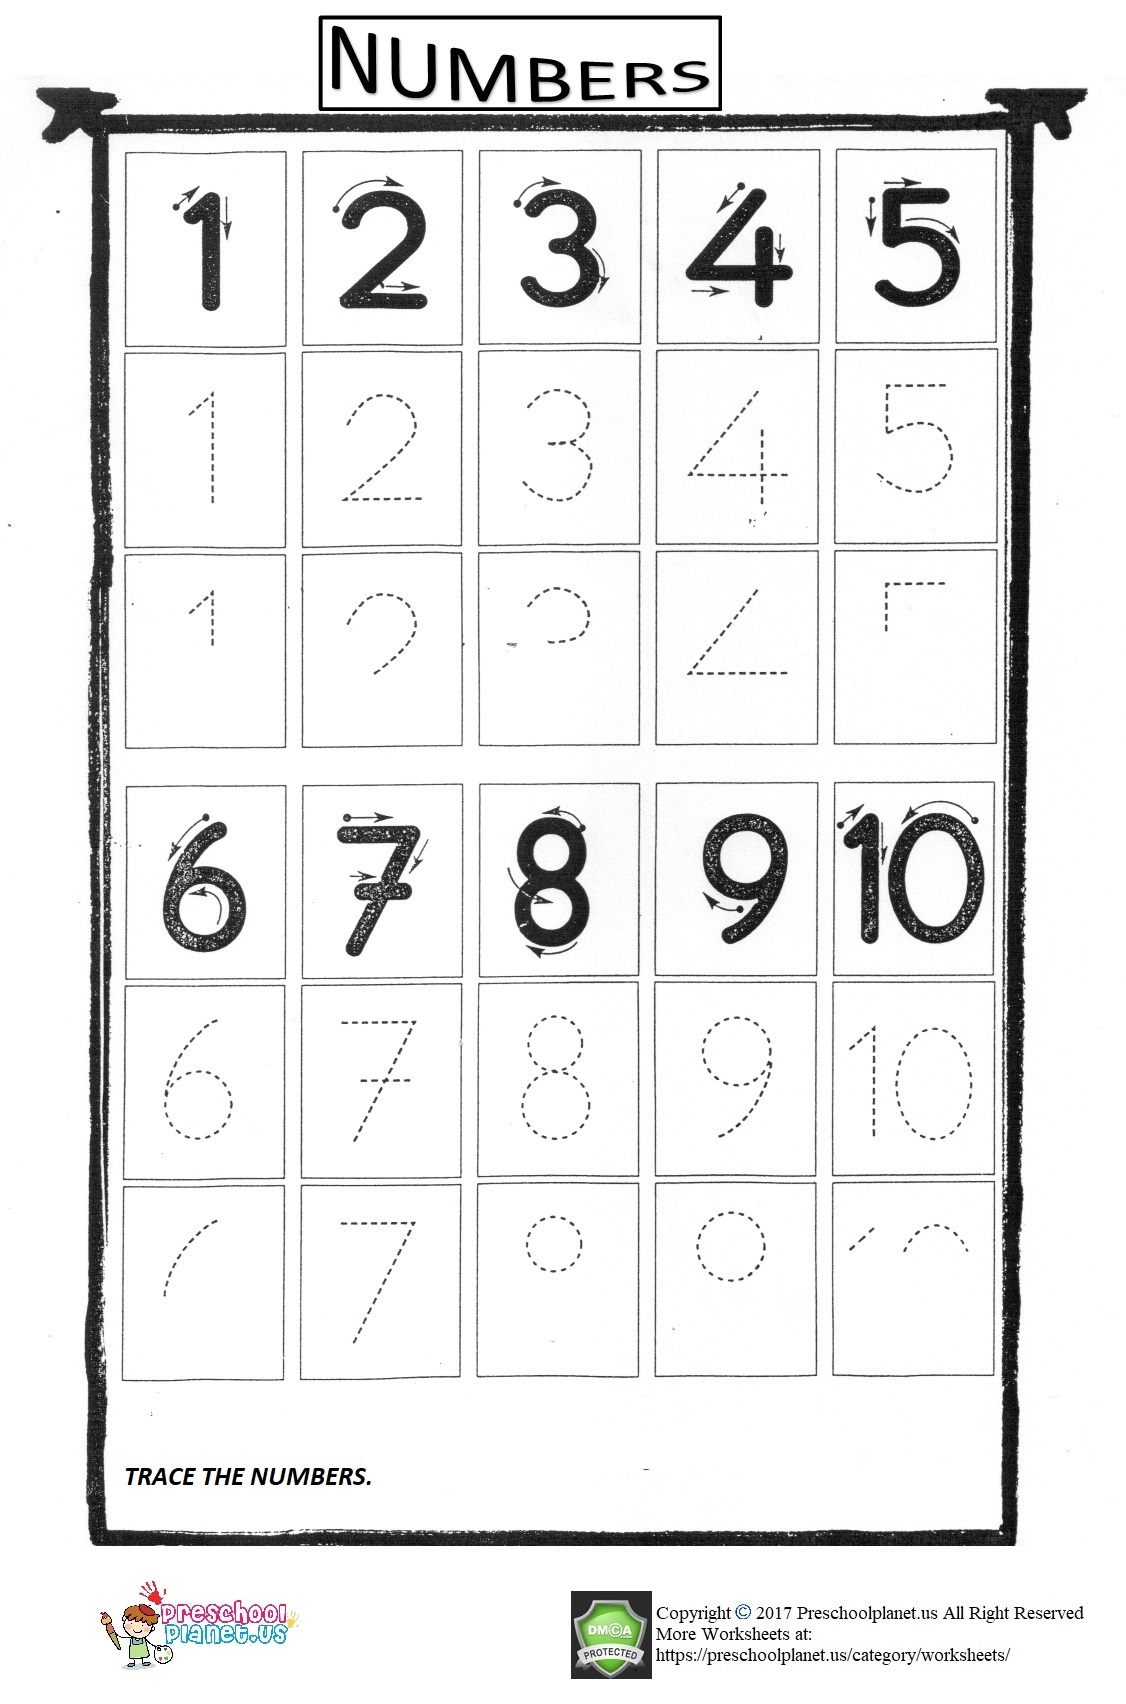 Number Trace Worksheet For Kids 1 10 Preschoolplanet